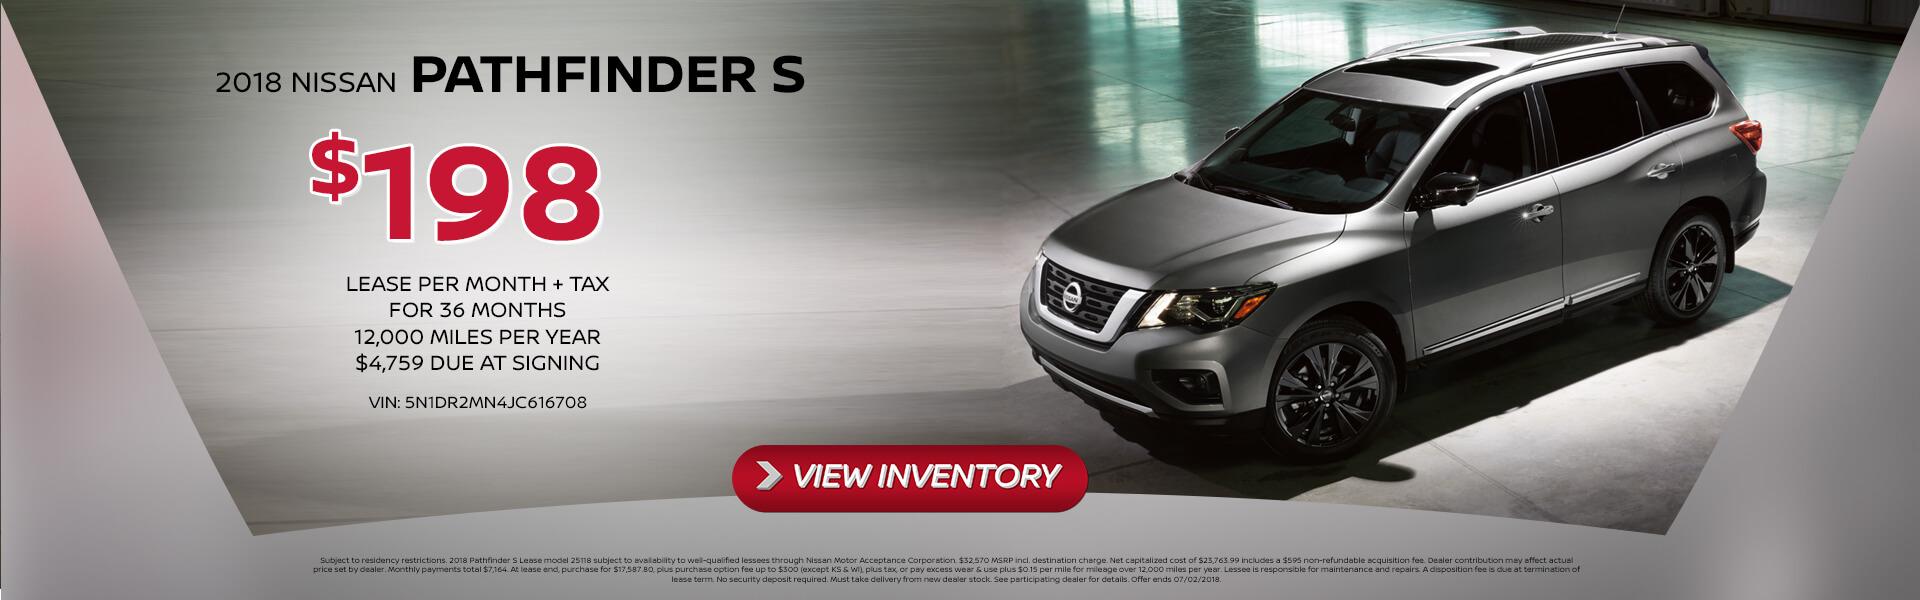 Pathfinder Lease $198